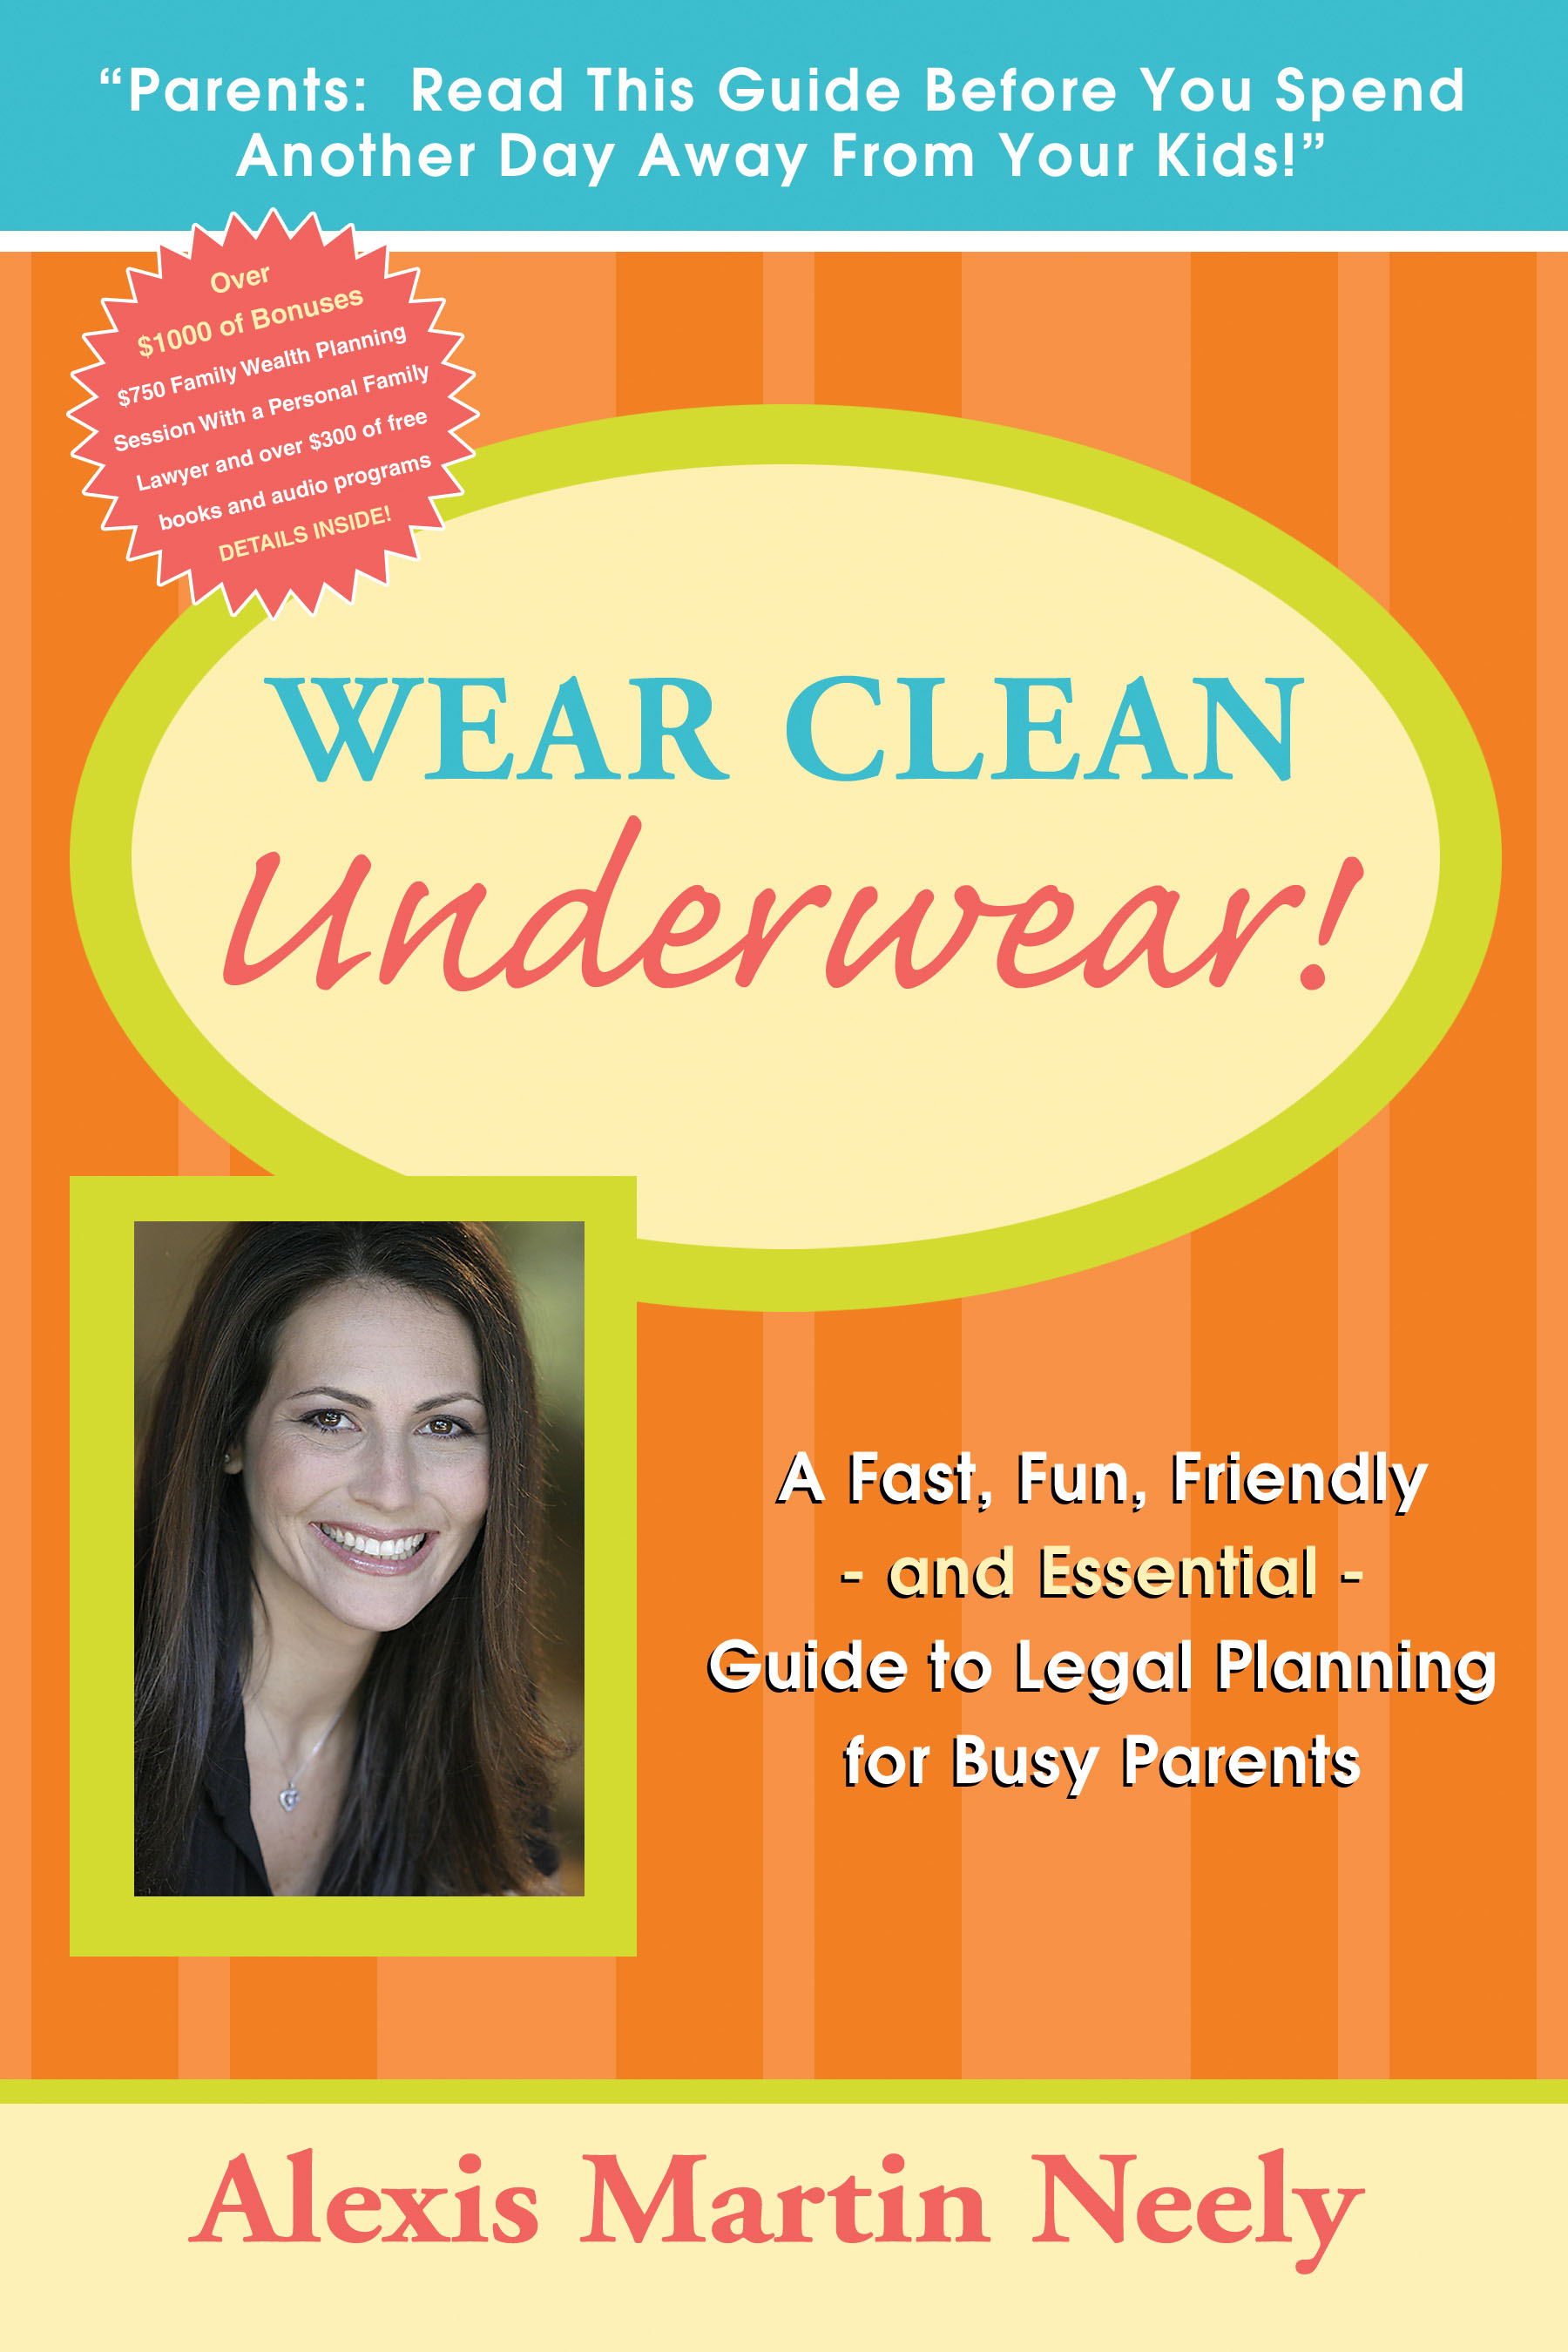 Front_Cover_of_Wear_Clean_Underwear.jpg